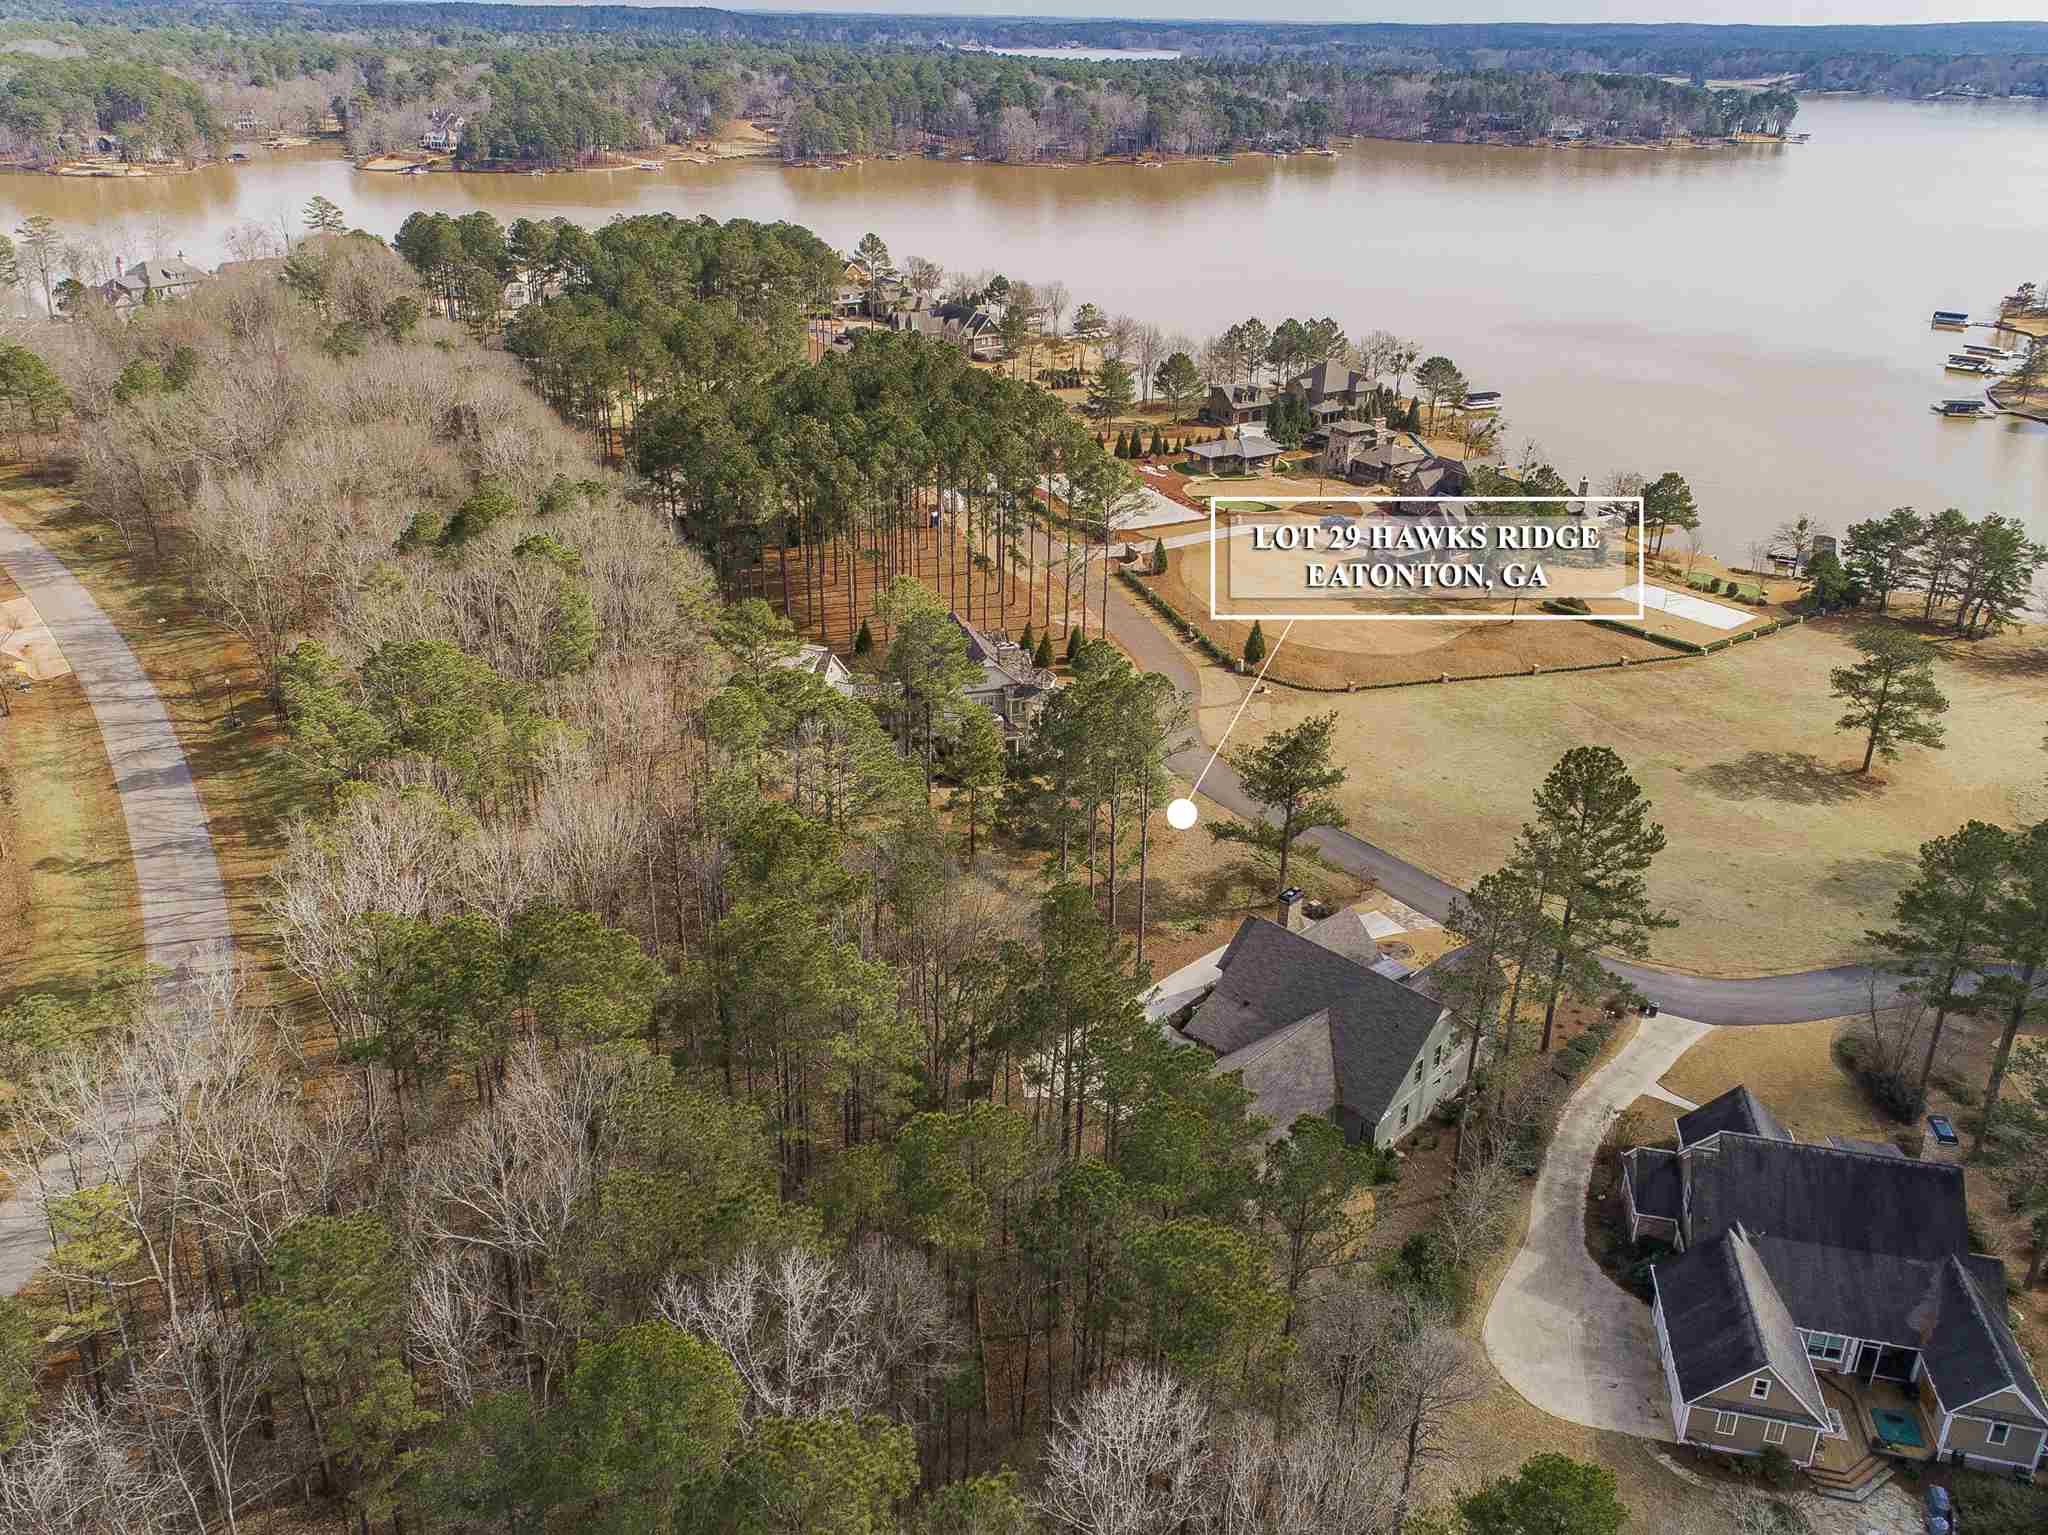 Property for sale at Lot 29 K HAWKS RIDGE, Eatonton,  Georgia 31024